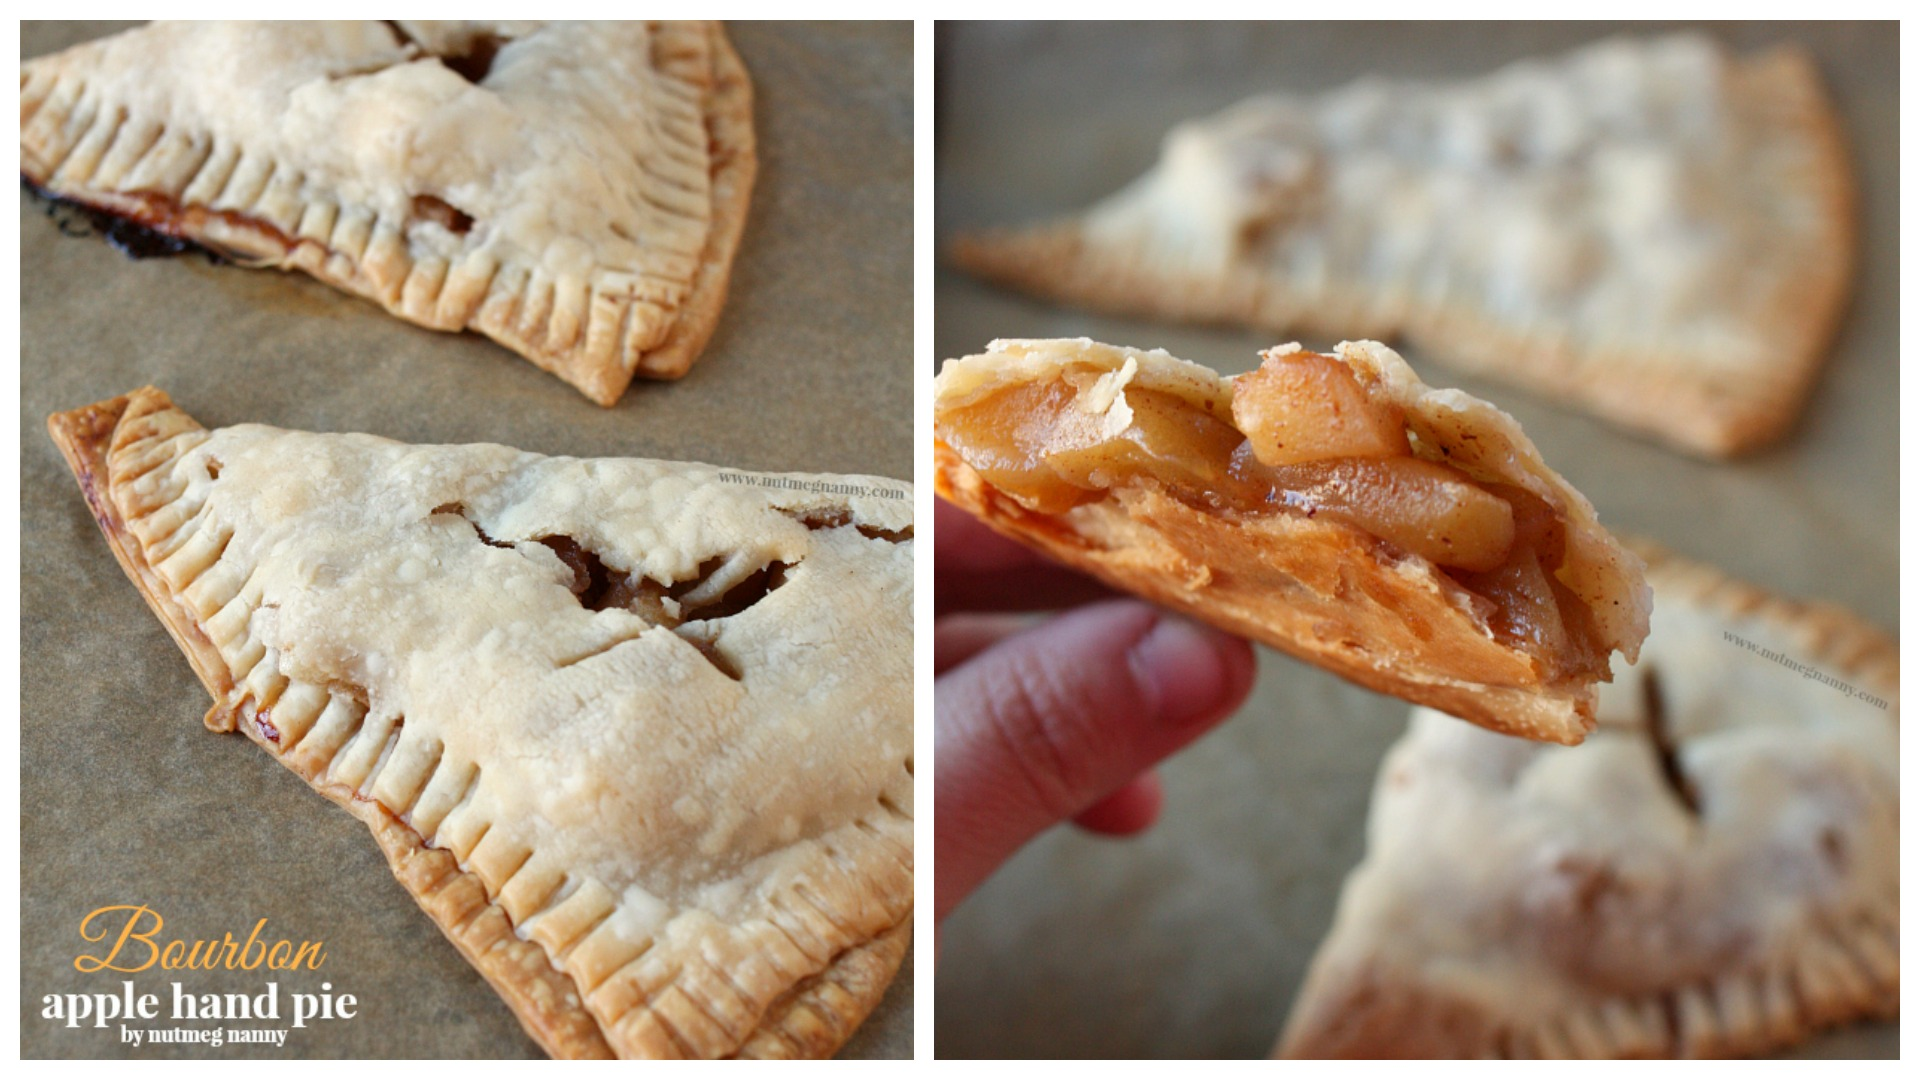 Bourbon apple pie recipe from Nutmeg Nanny